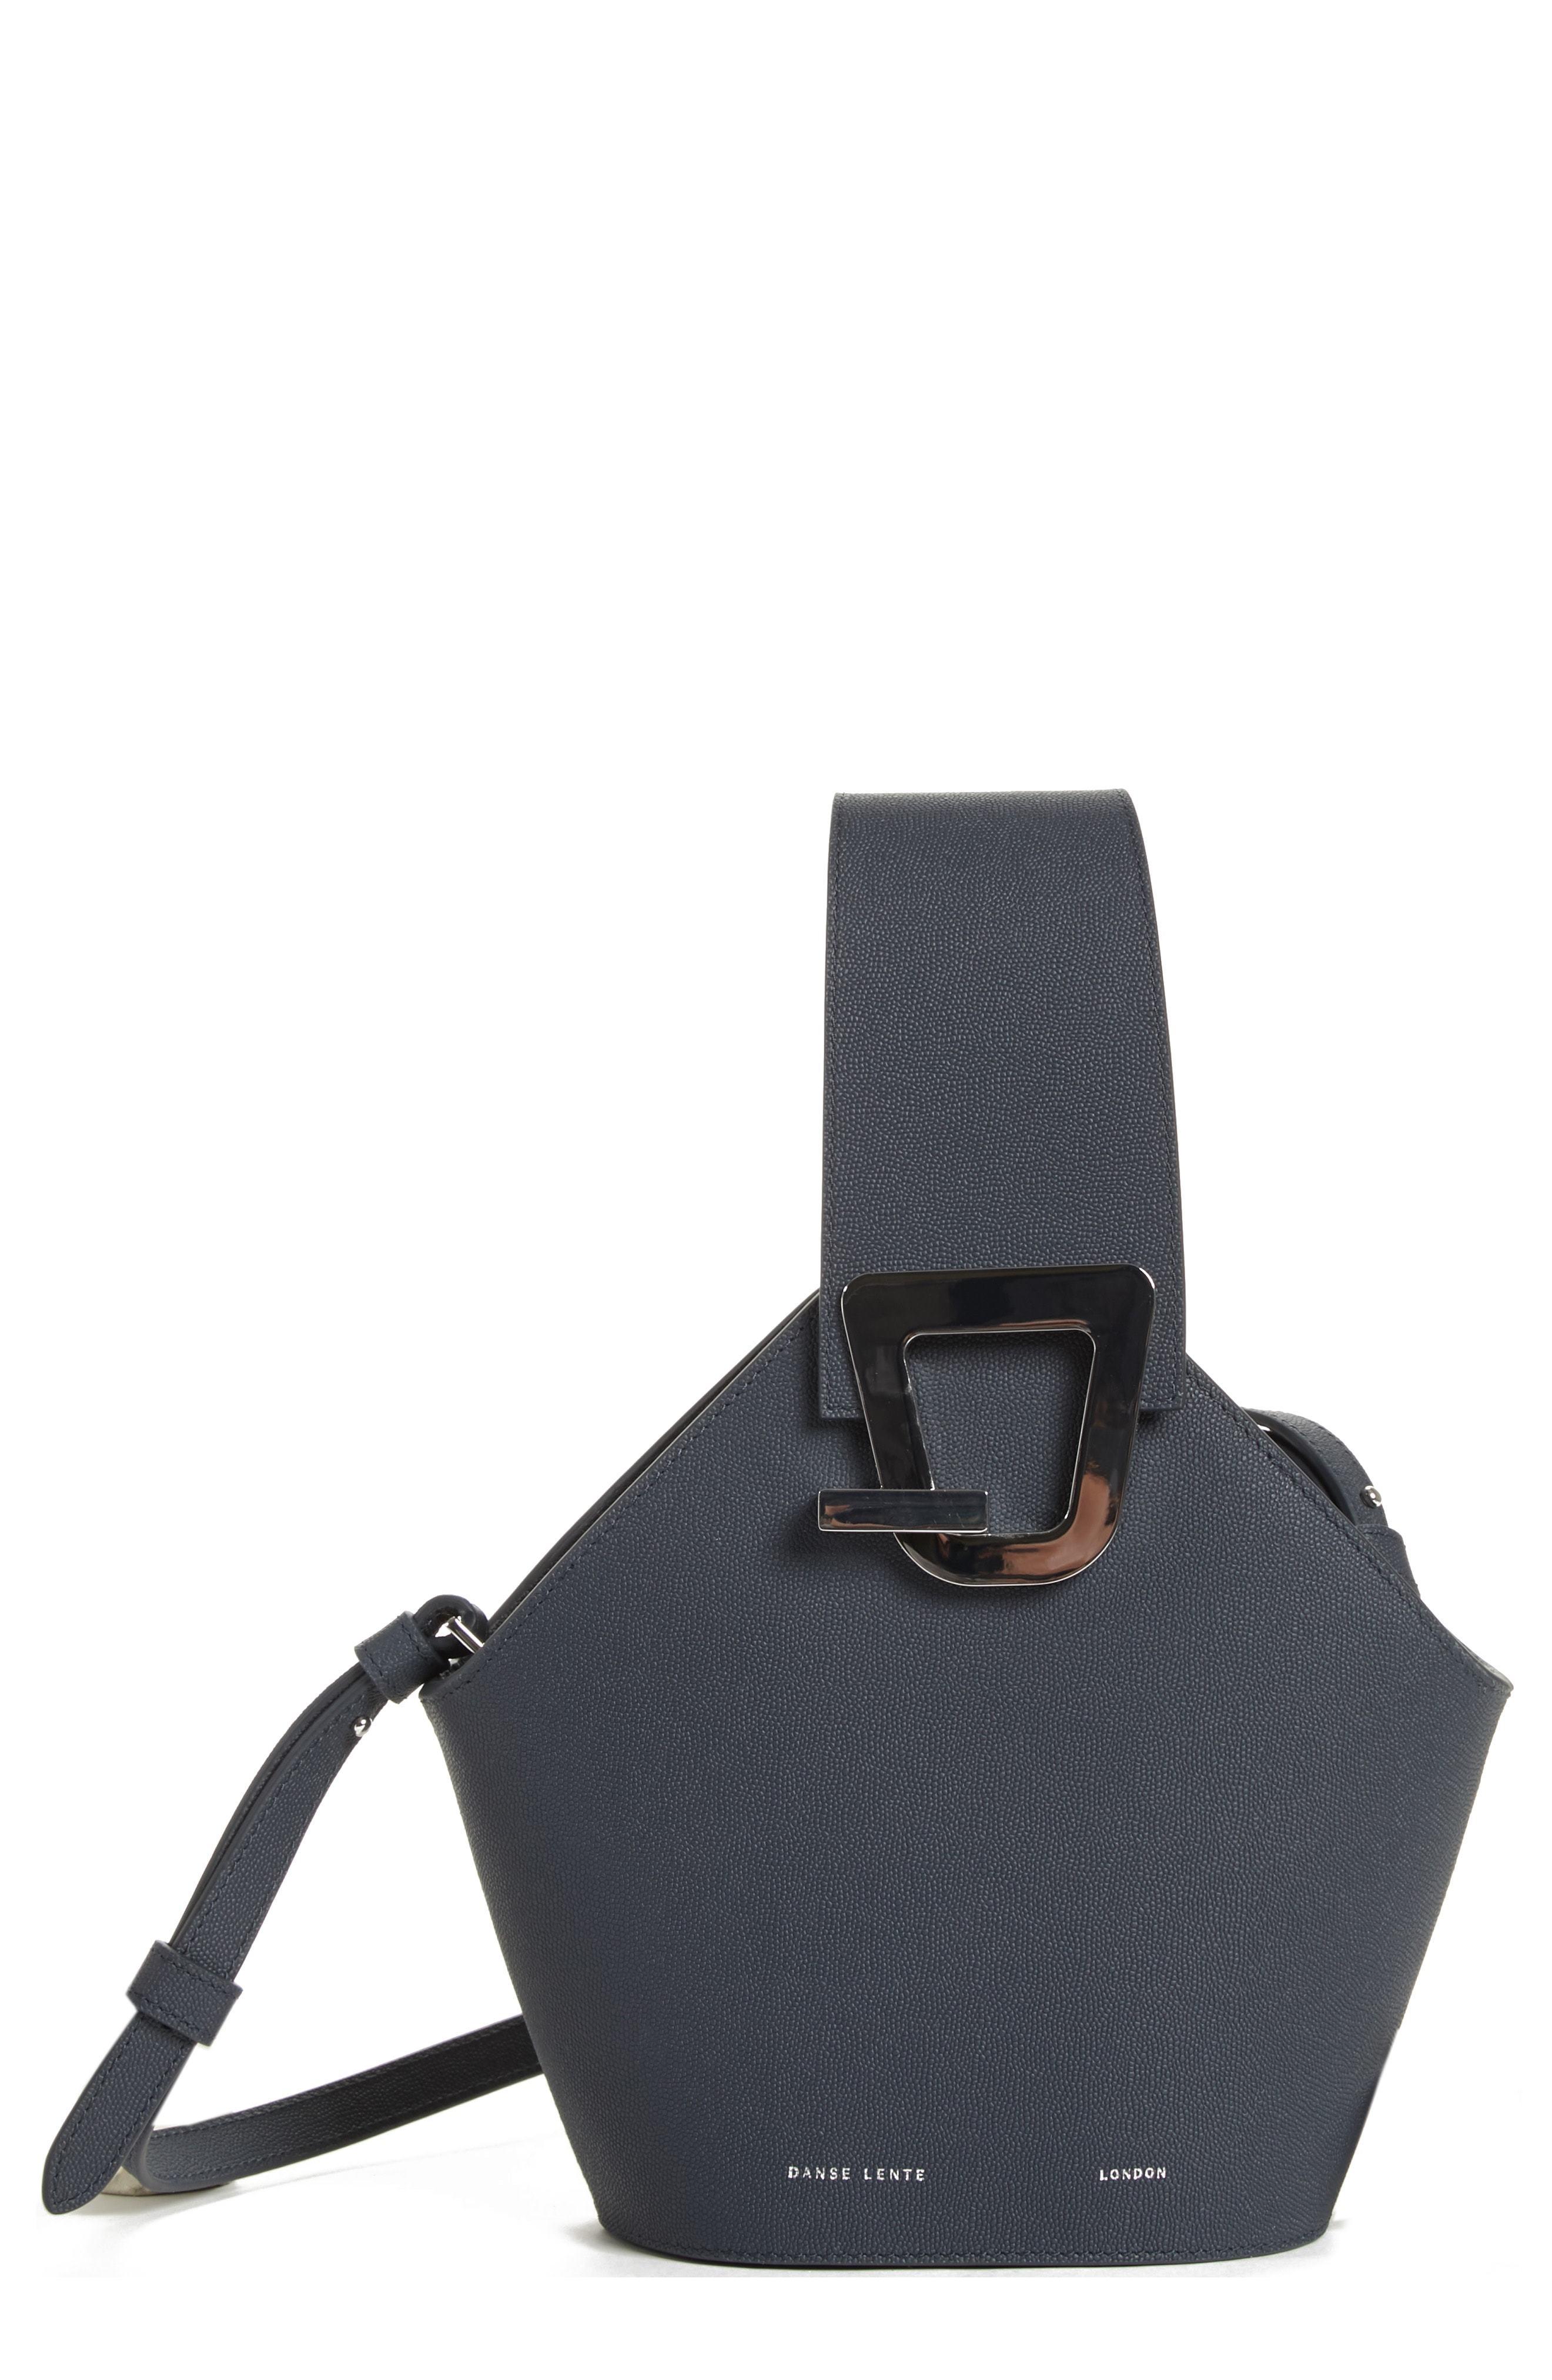 80ae6df8bb87 ... Danse Lente Mini Johnny Leather Bucket Bag